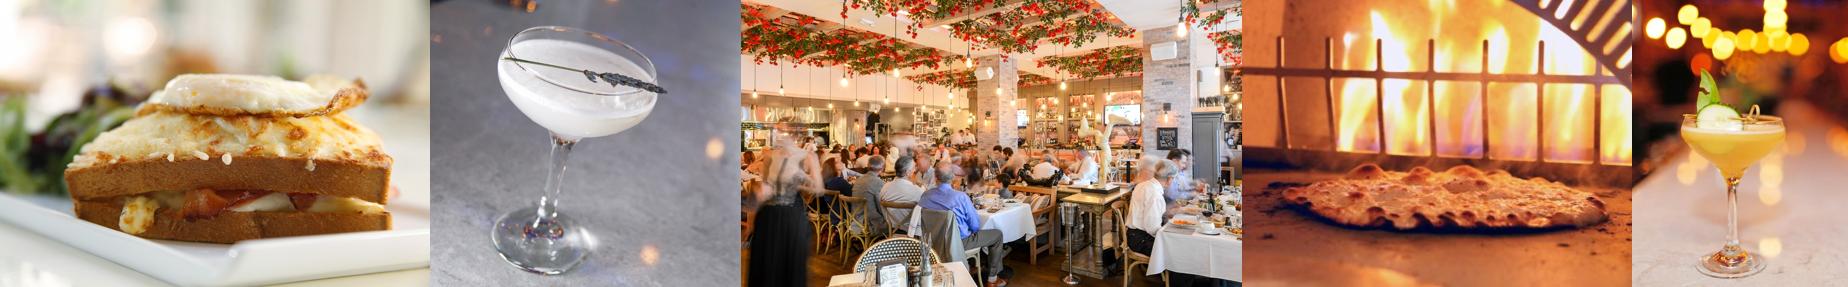 Brasserie Azur Brunch and Happy Hour in Miami